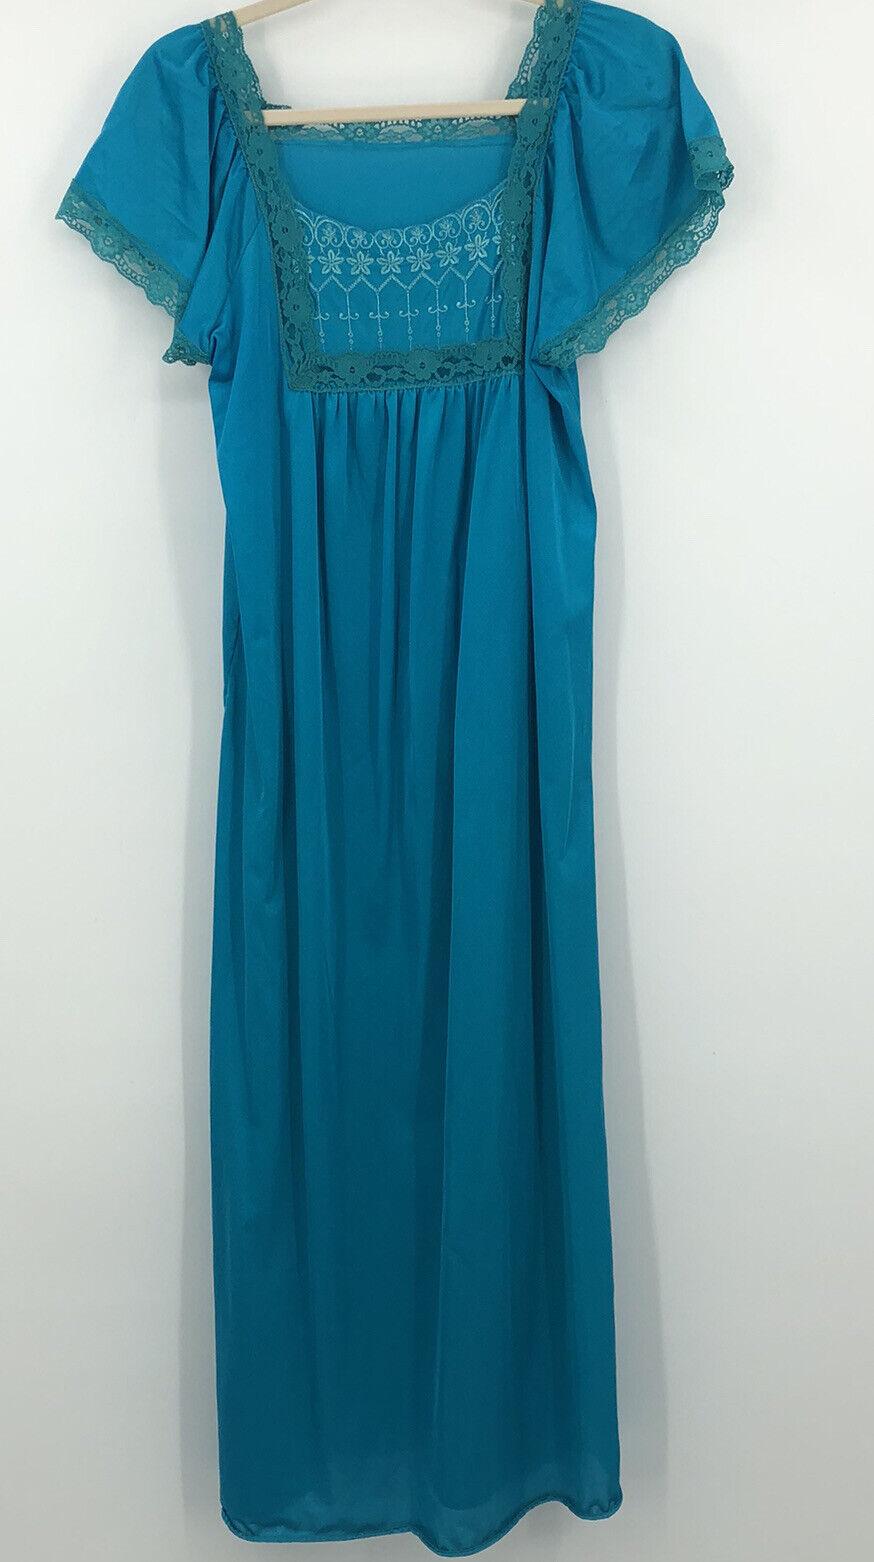 Nightgown ML Turquoise Blue Glam Garb Handmade USA Hand-Dyed Vintage Nightie Retro Lacy Gown Romantic Dress Victorian Boudoir Feminine Mori